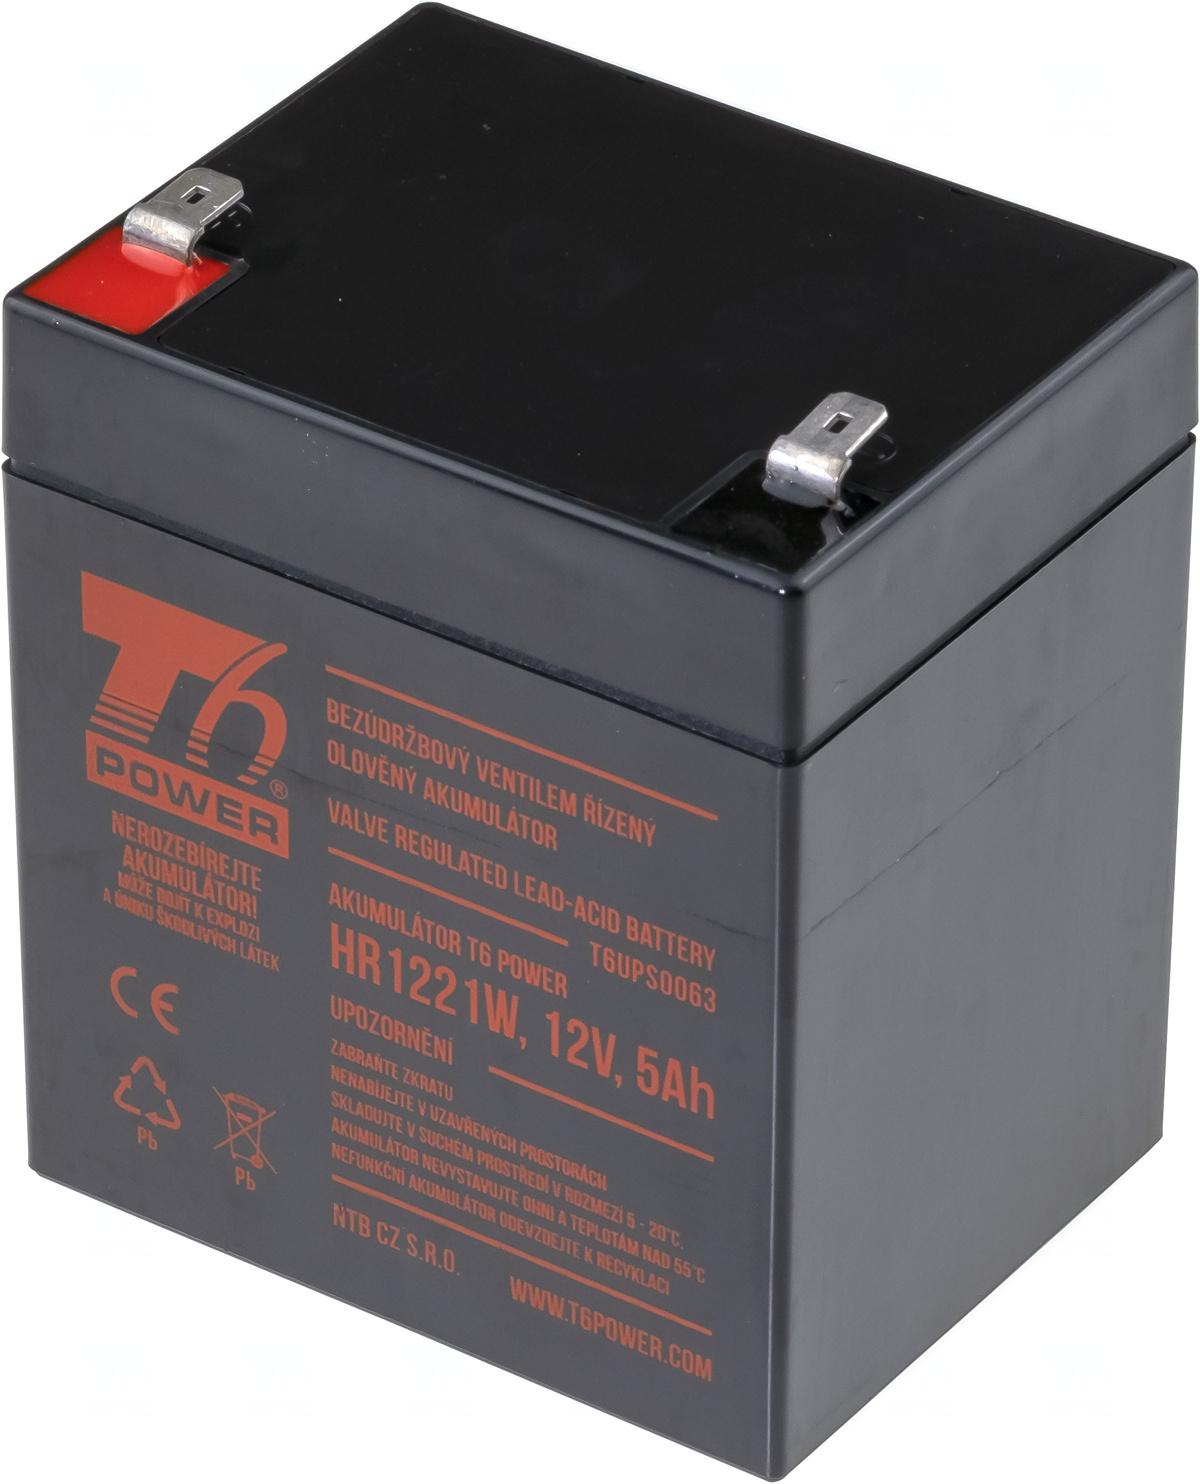 Akumulátor T6 Power HR1221W, 12V, 5Ah